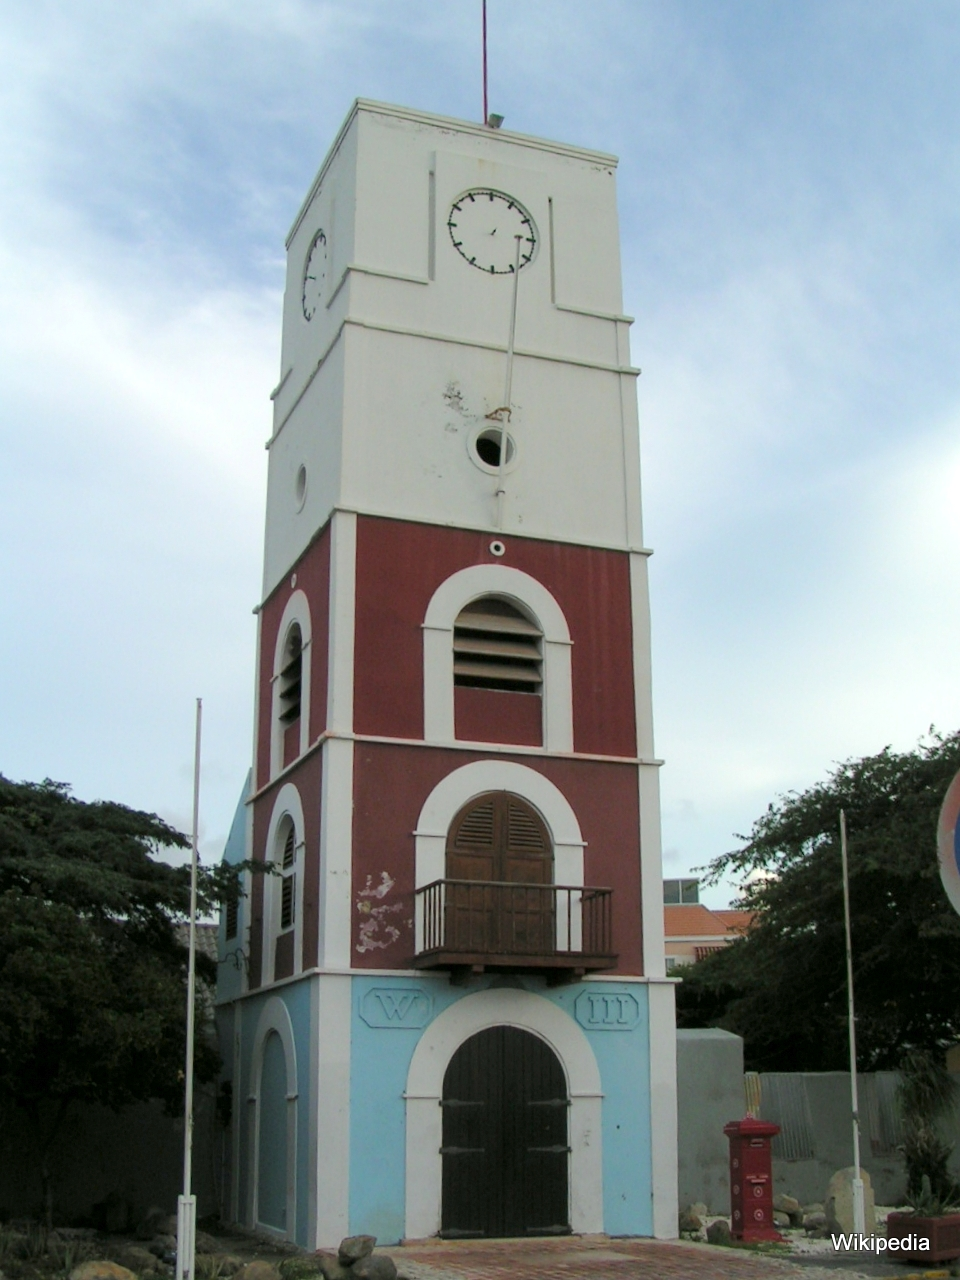 Aruba Oranjestad Fort Zoutman Willem Iii Tower